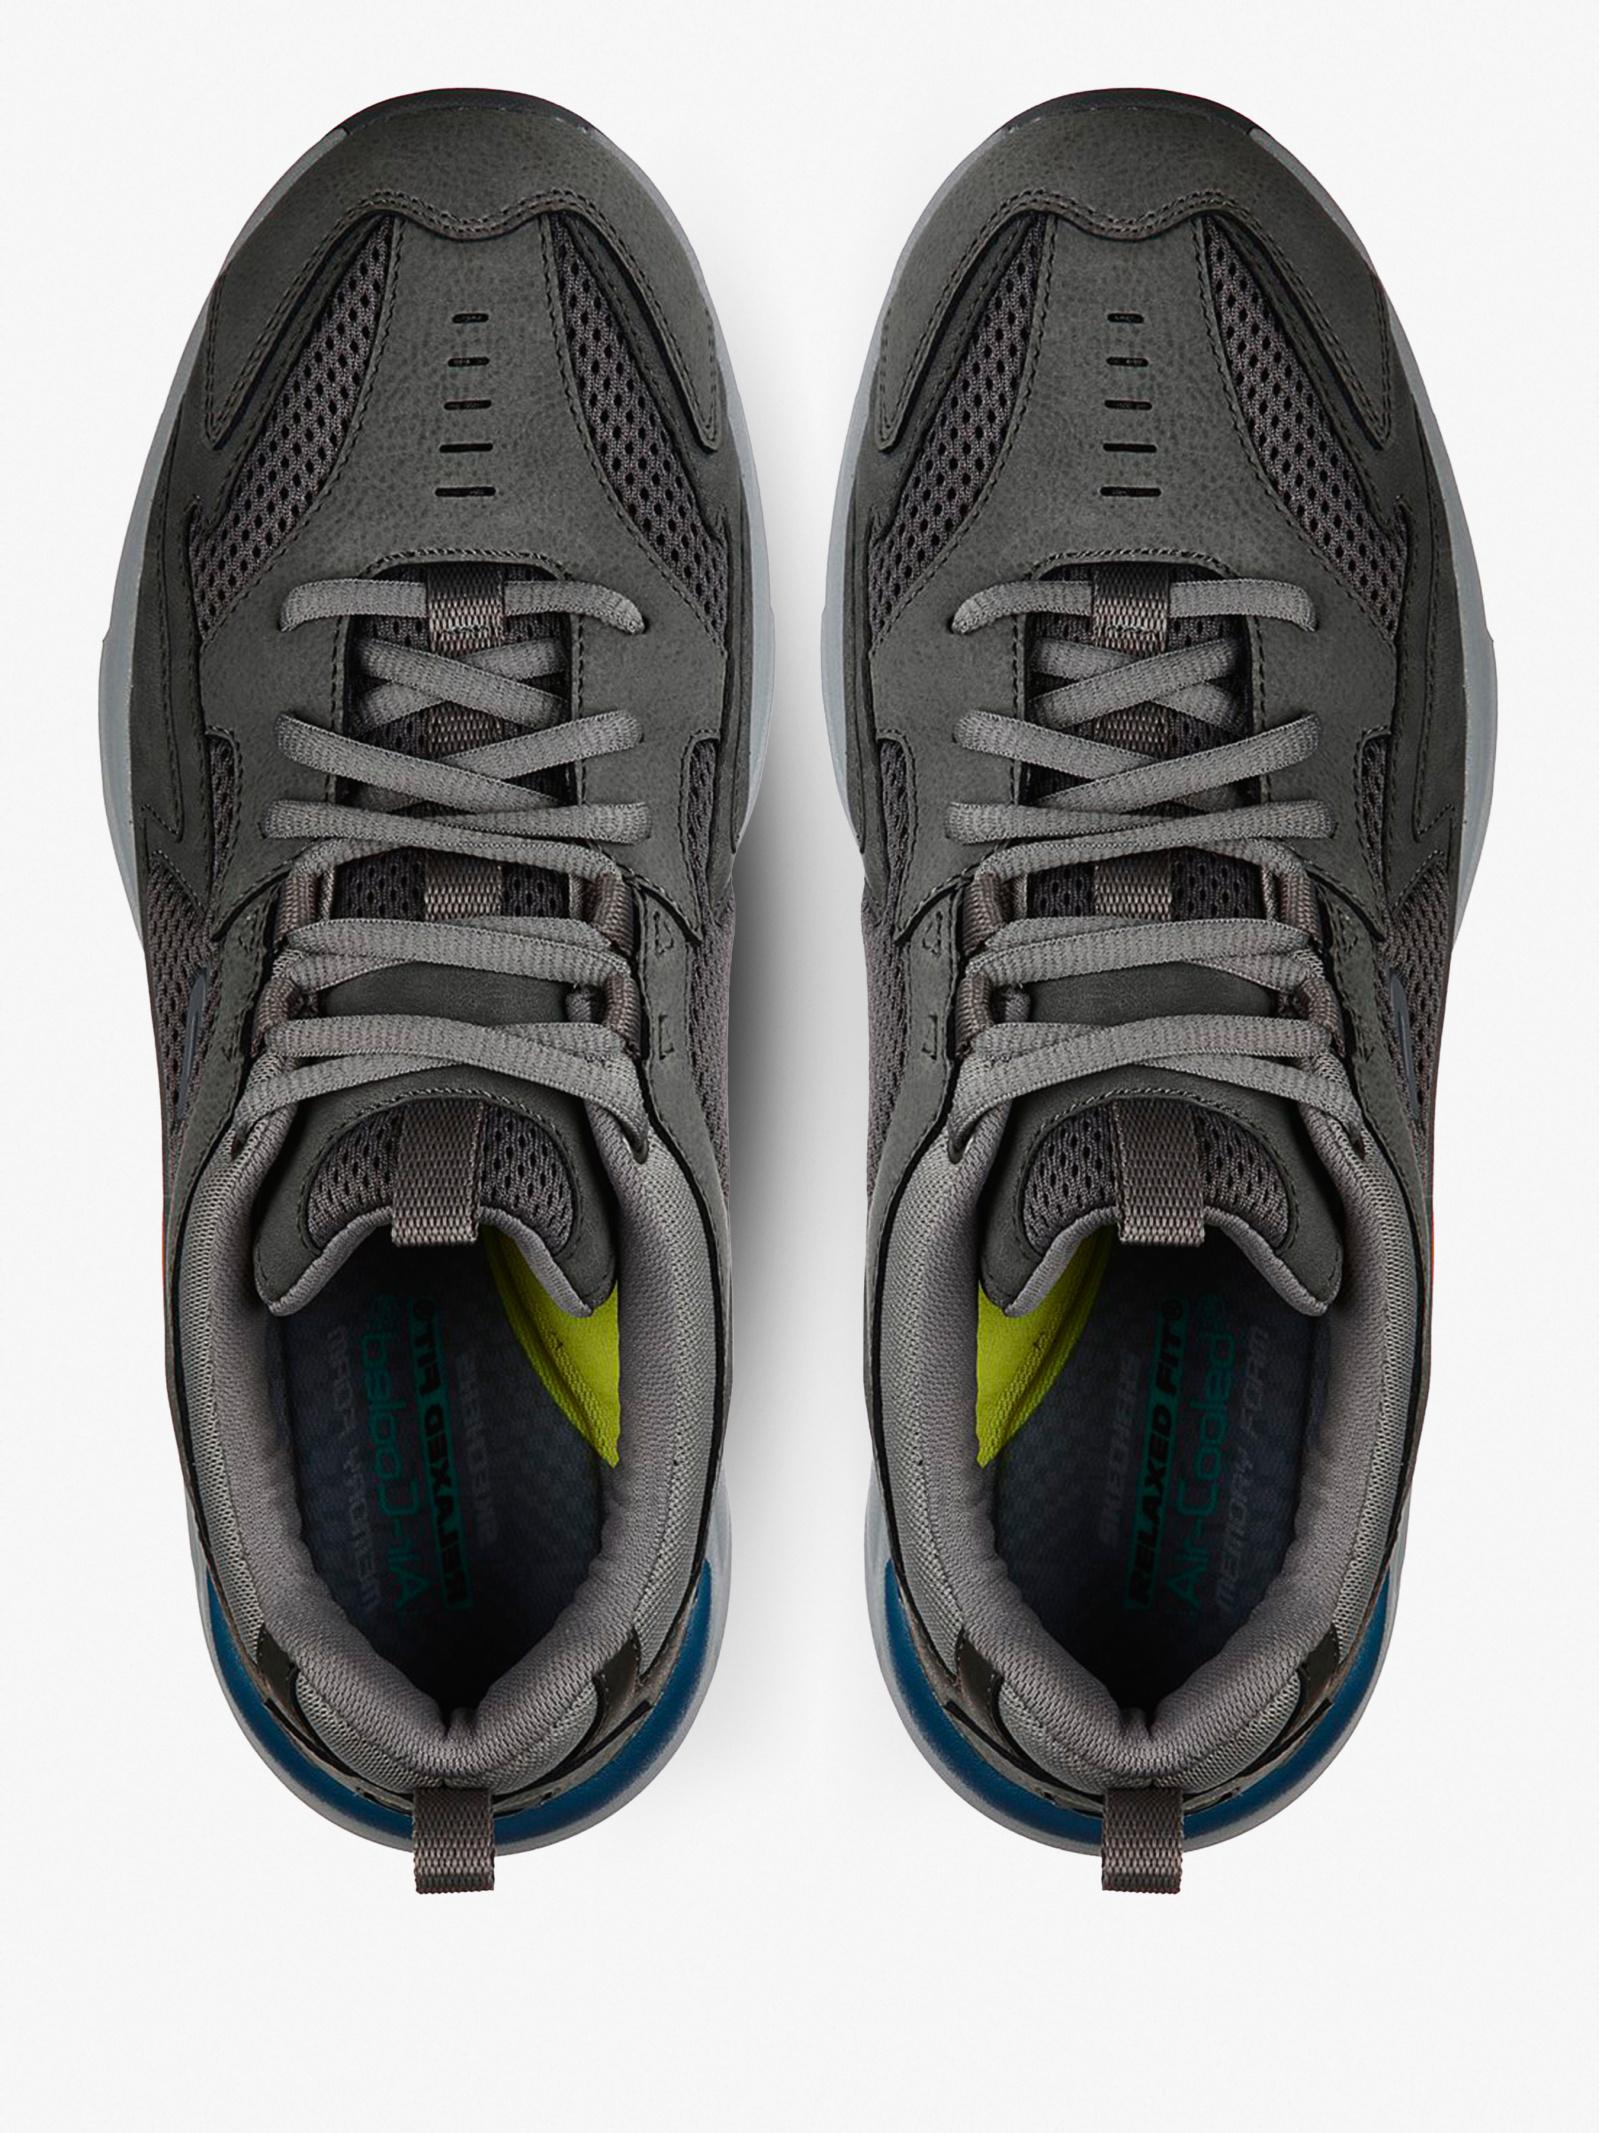 Кроссовки для мужчин Skechers USA Streetwear 210037 GRY размерная сетка обуви, 2017